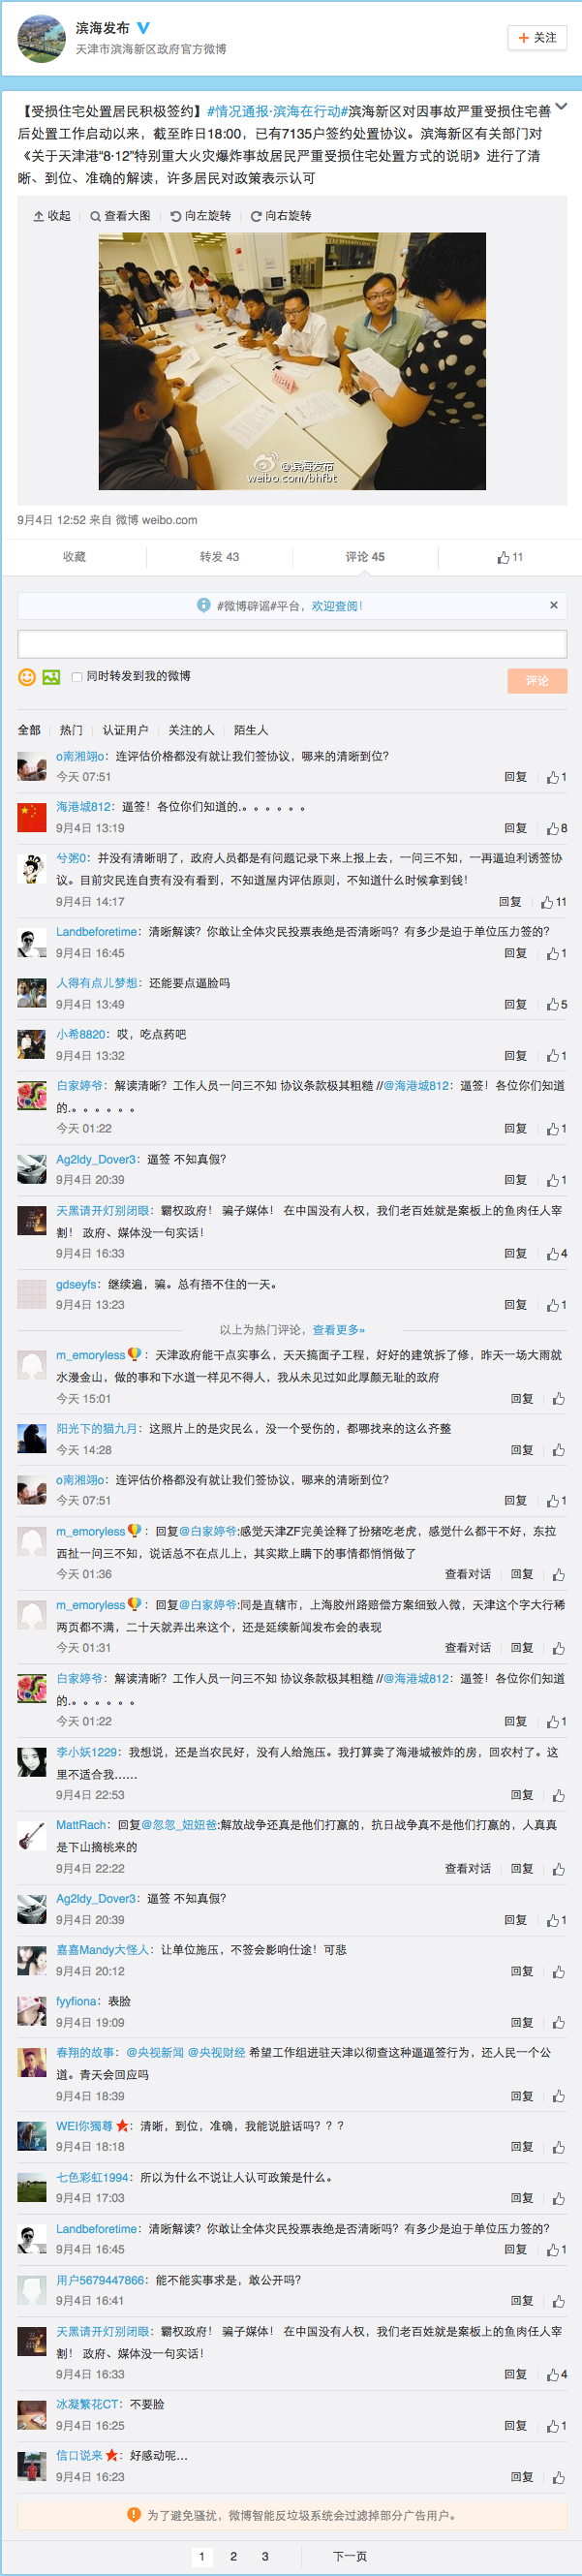 screenshot-weibo com 2015-09-05 03-19-42